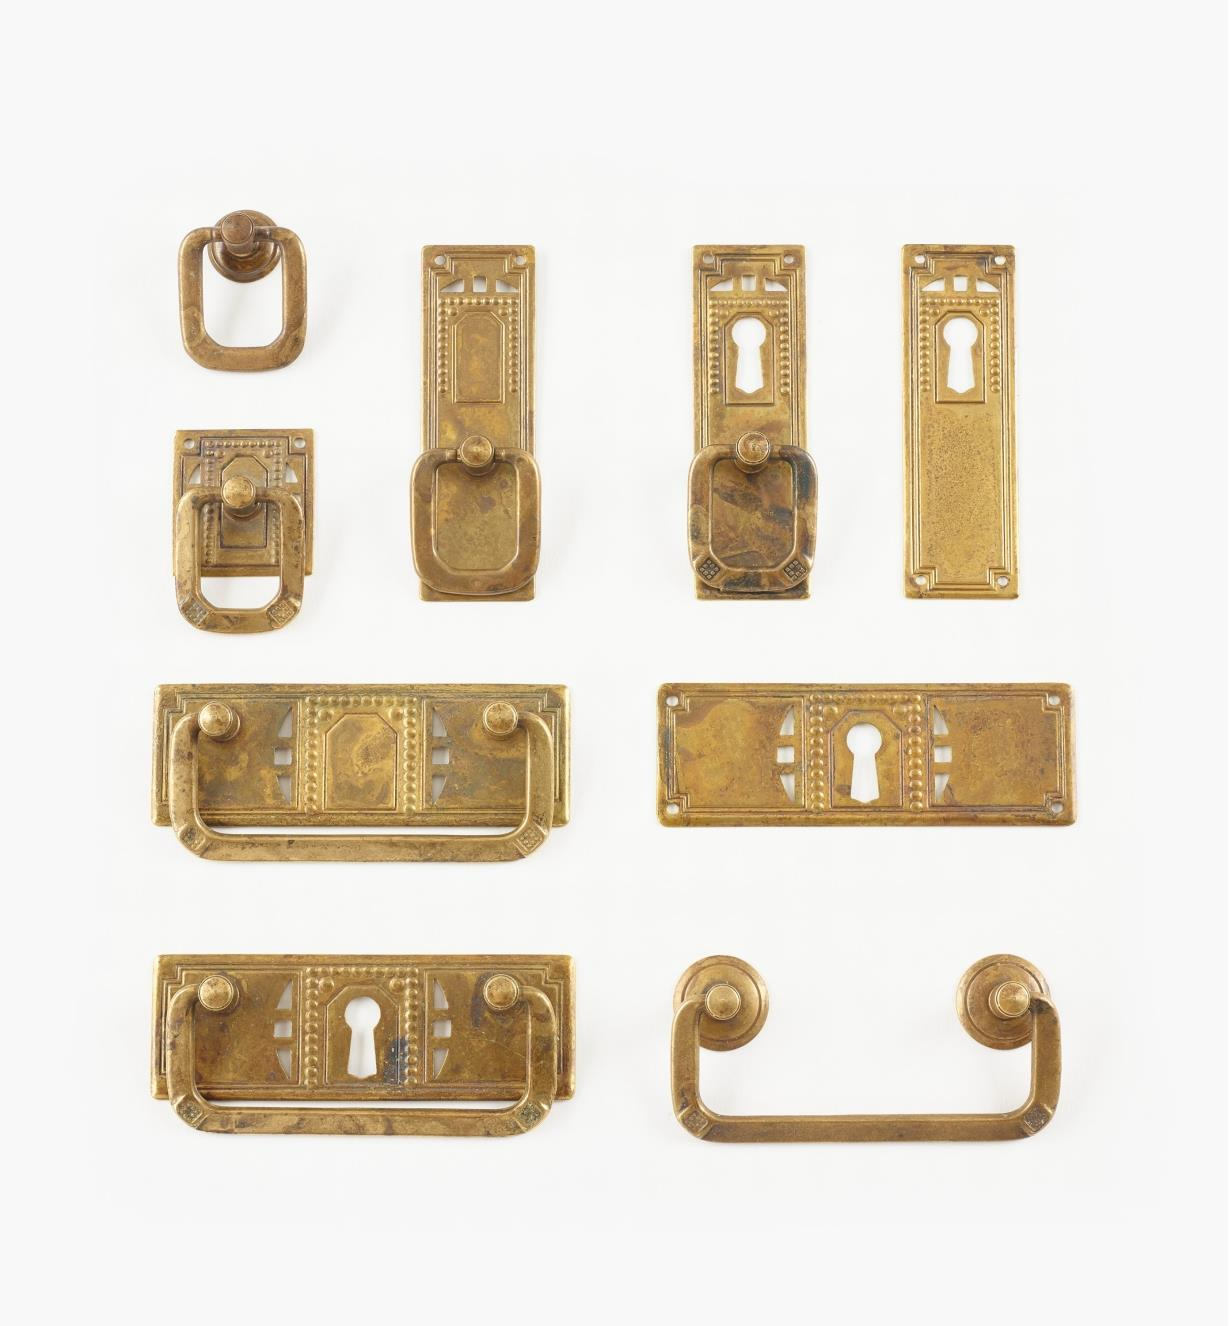 Pierced Rectangular Plate Hardware